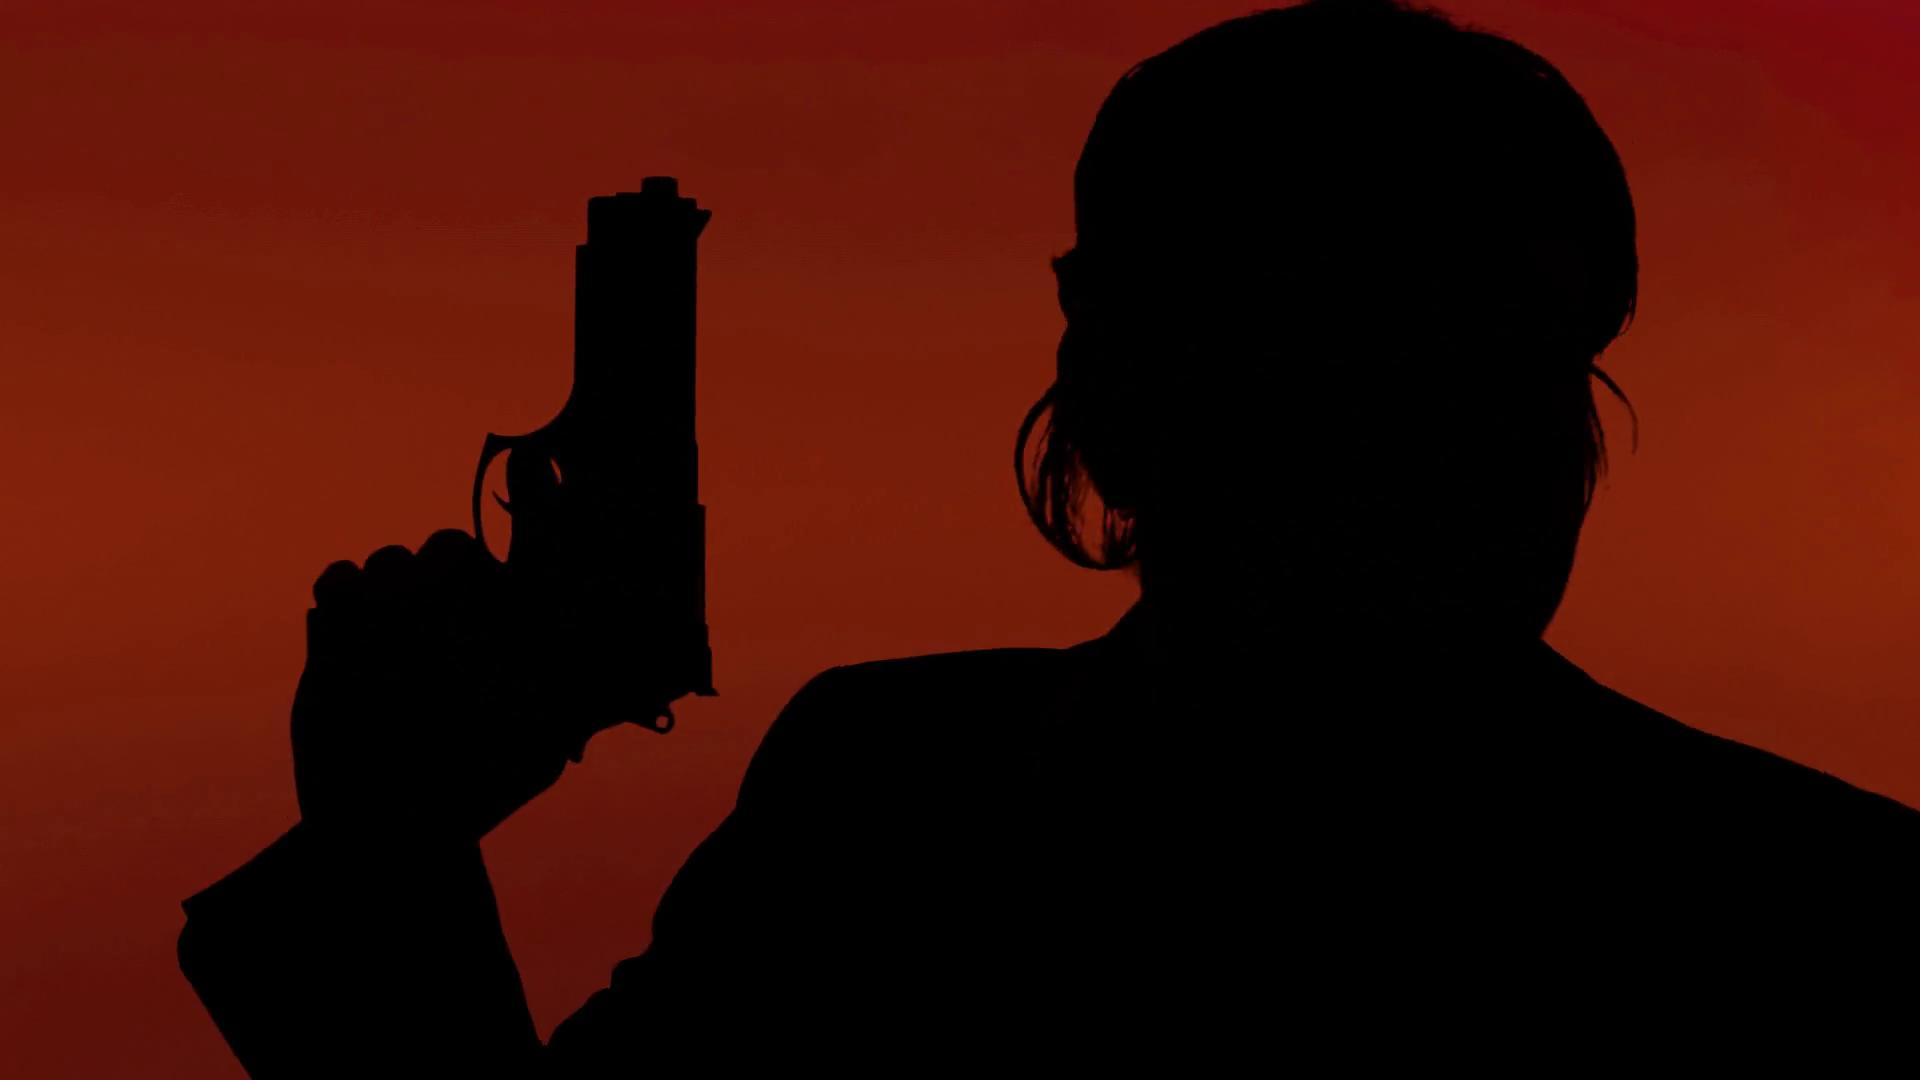 1920x1080 Silhouette Gun Handcuffs Detective Man Red. A Man (Cop, Detective